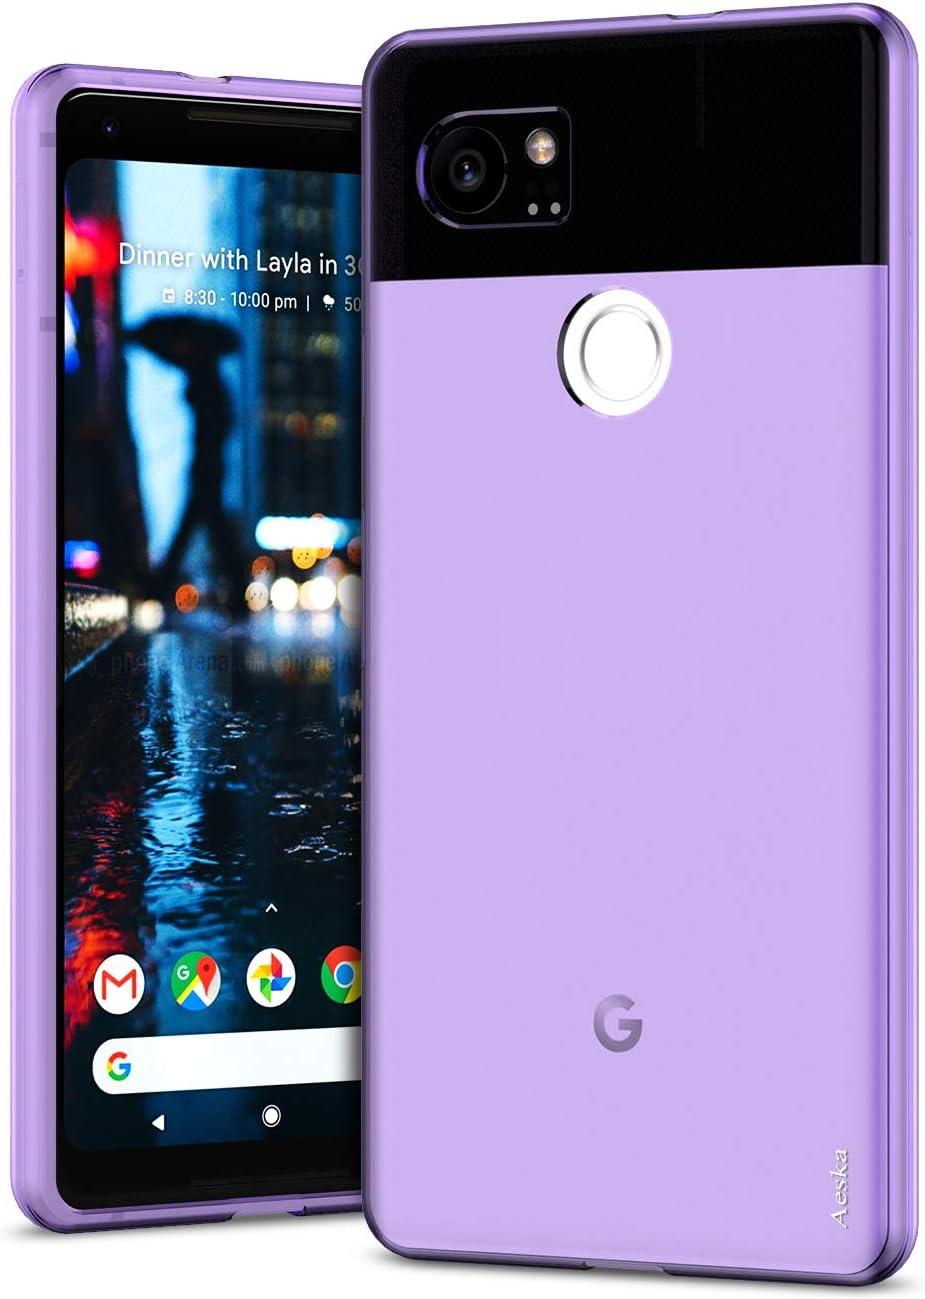 Aeska Google Pixel 2 XL Case, Ultra [Slim Thin] Flexible Clear Soft TPU [Anti-Scratches] Gel Premium Rubber Transparent Skin Silicone Protective Case Cover for Google Pixel 2 XL (Purple)